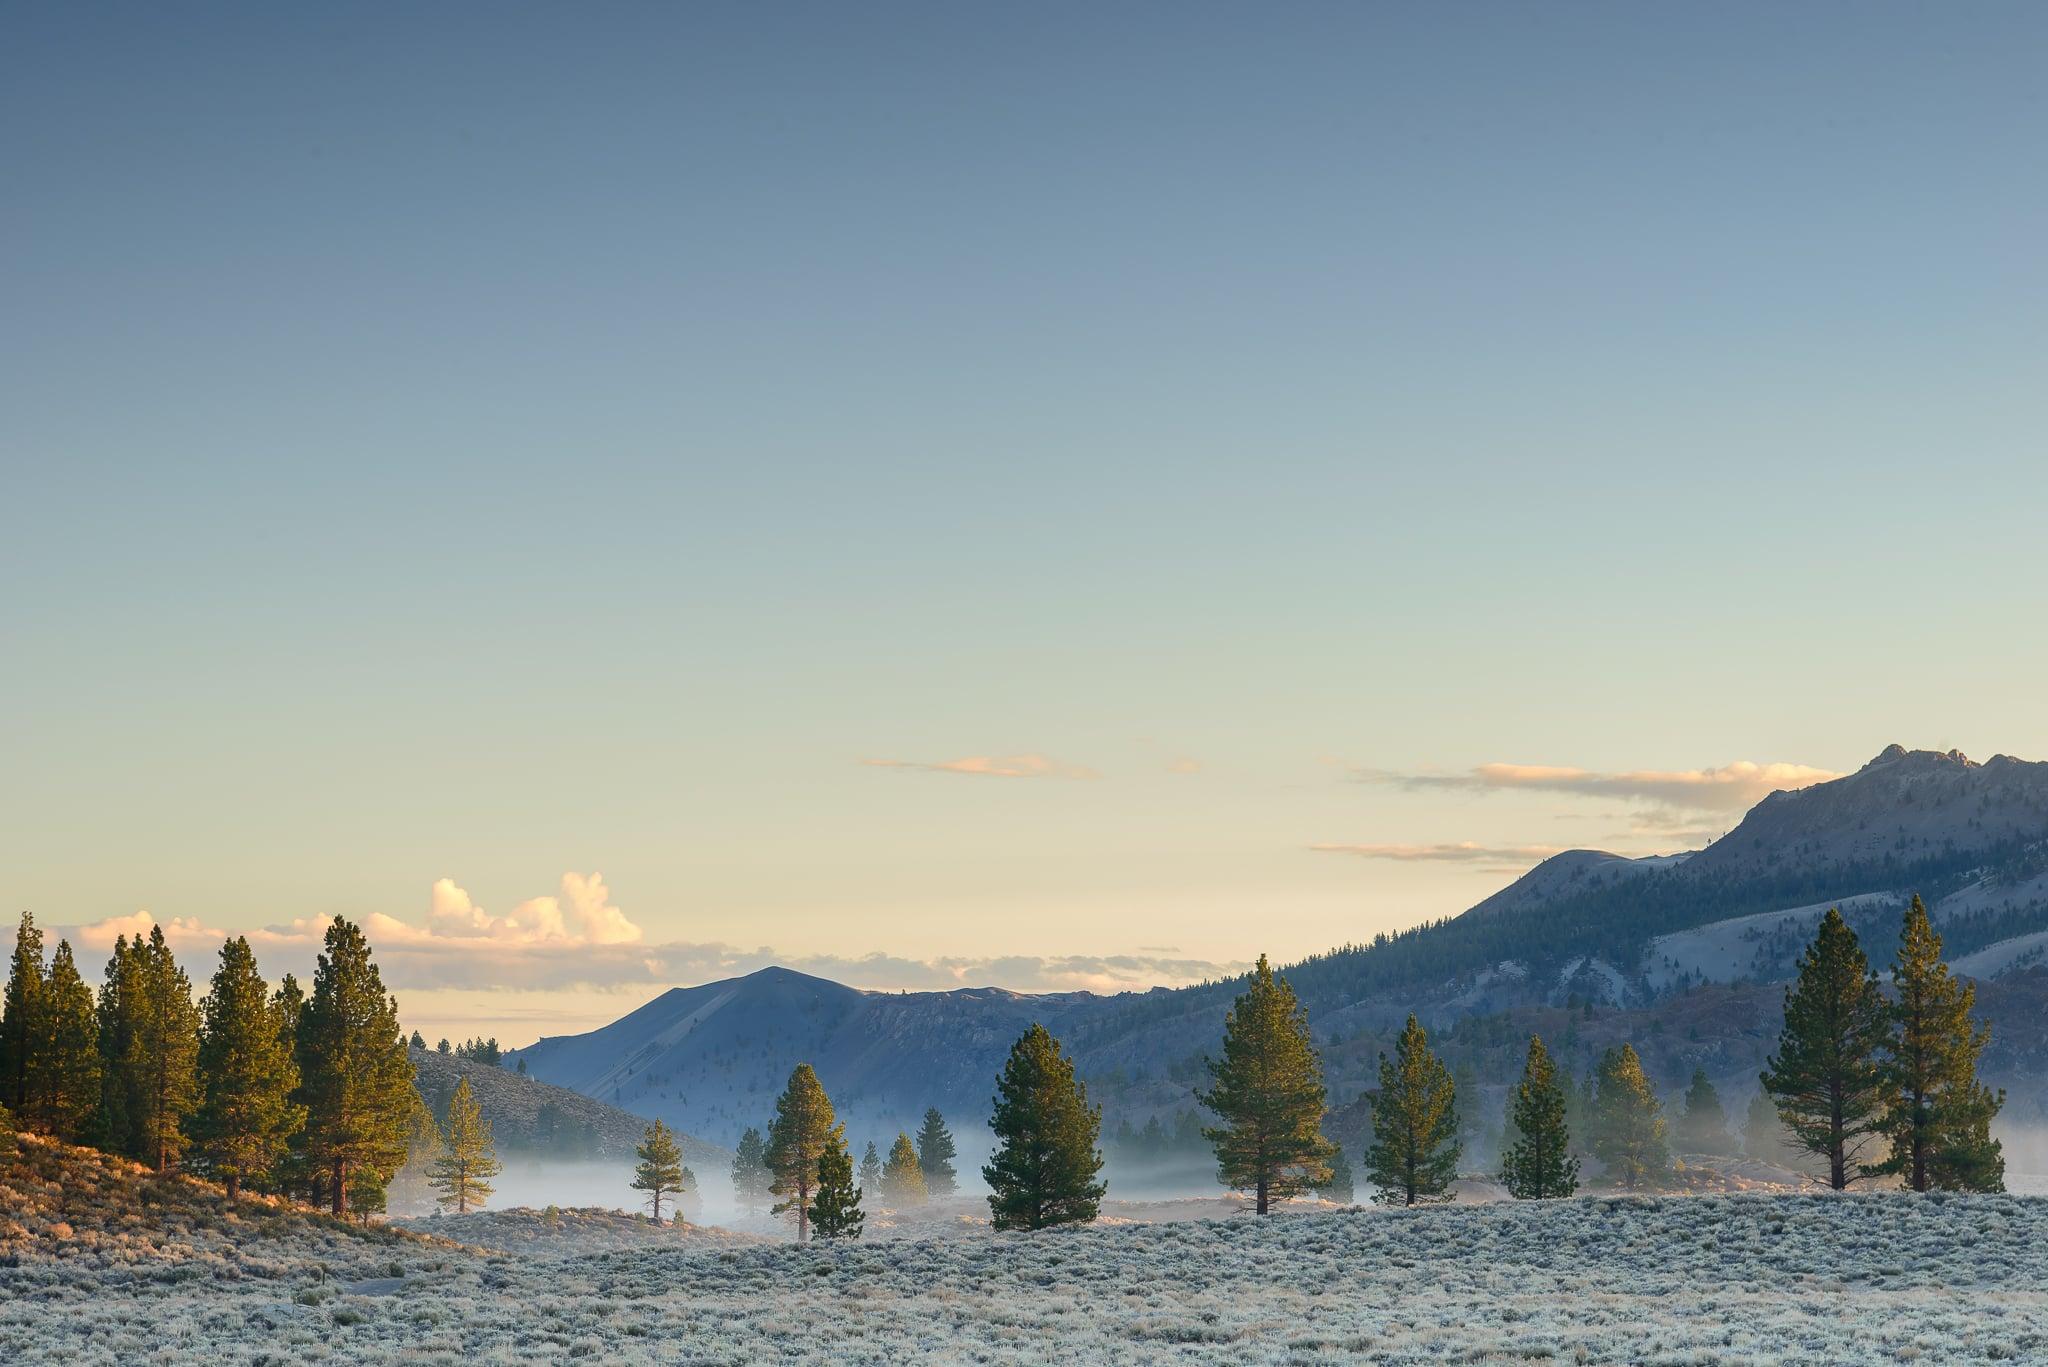 June Lake adjacent and early morning fog.